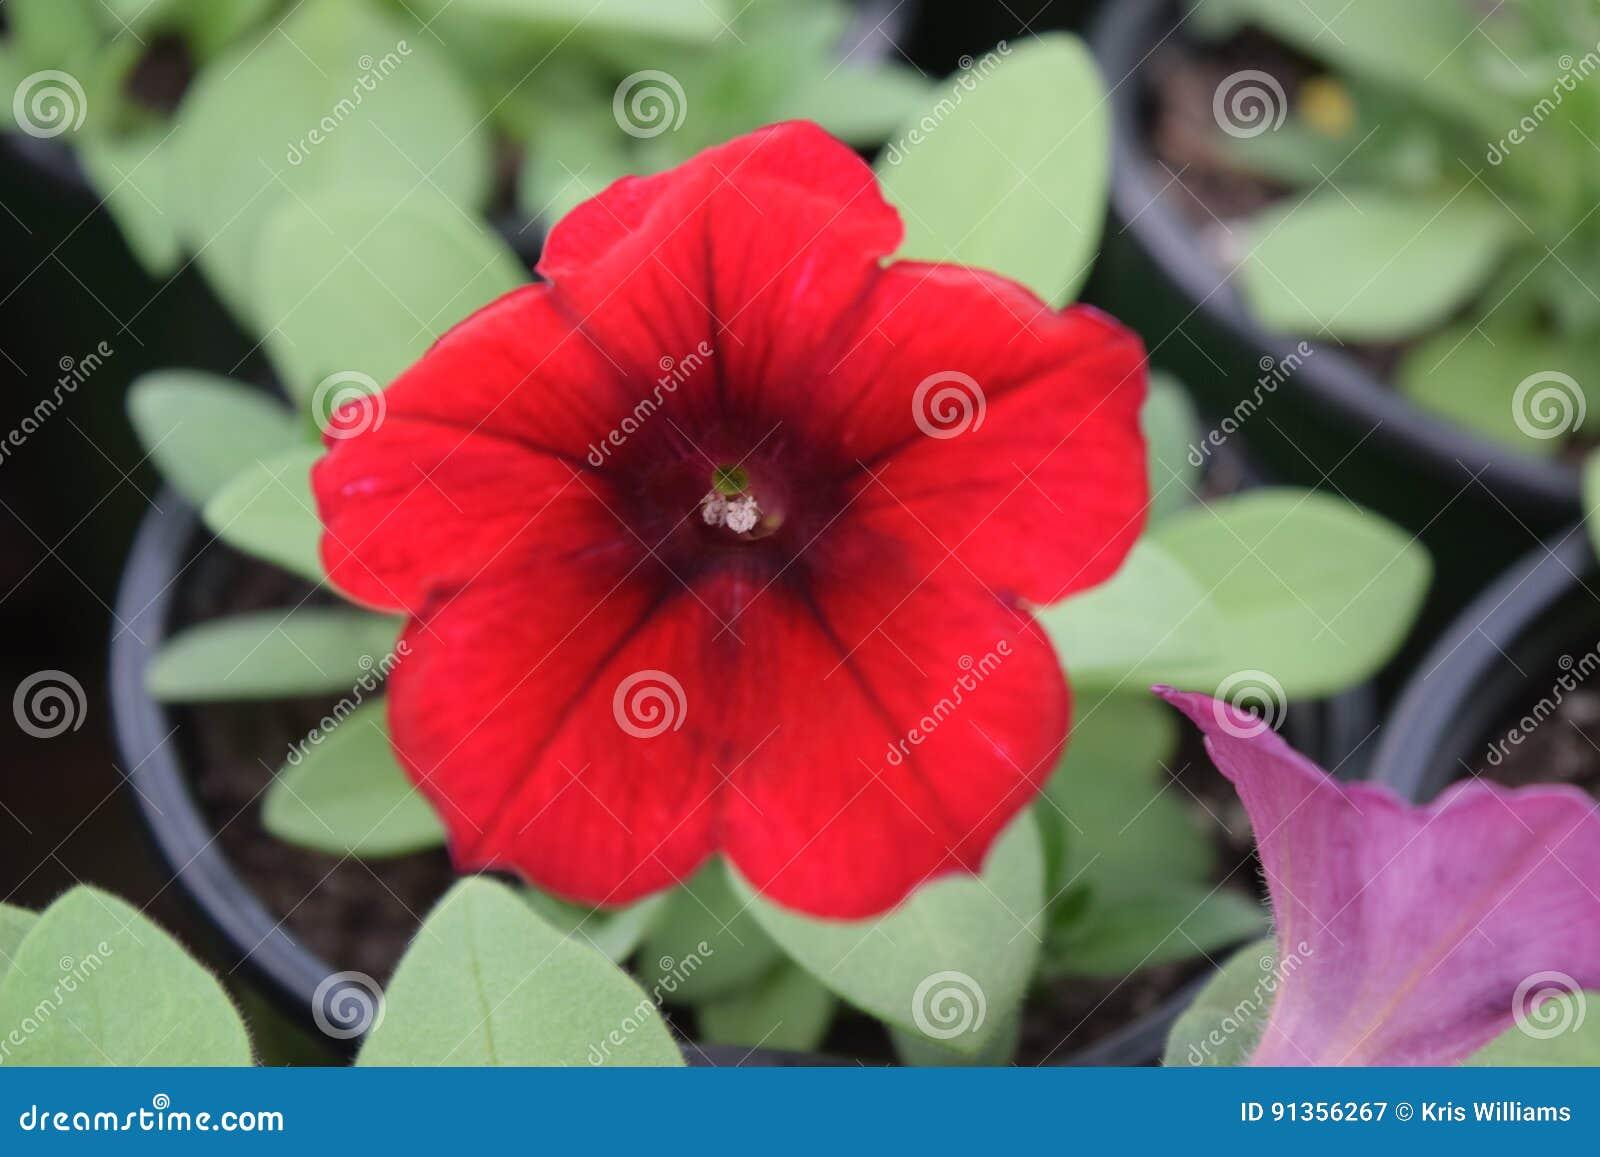 Red petunia